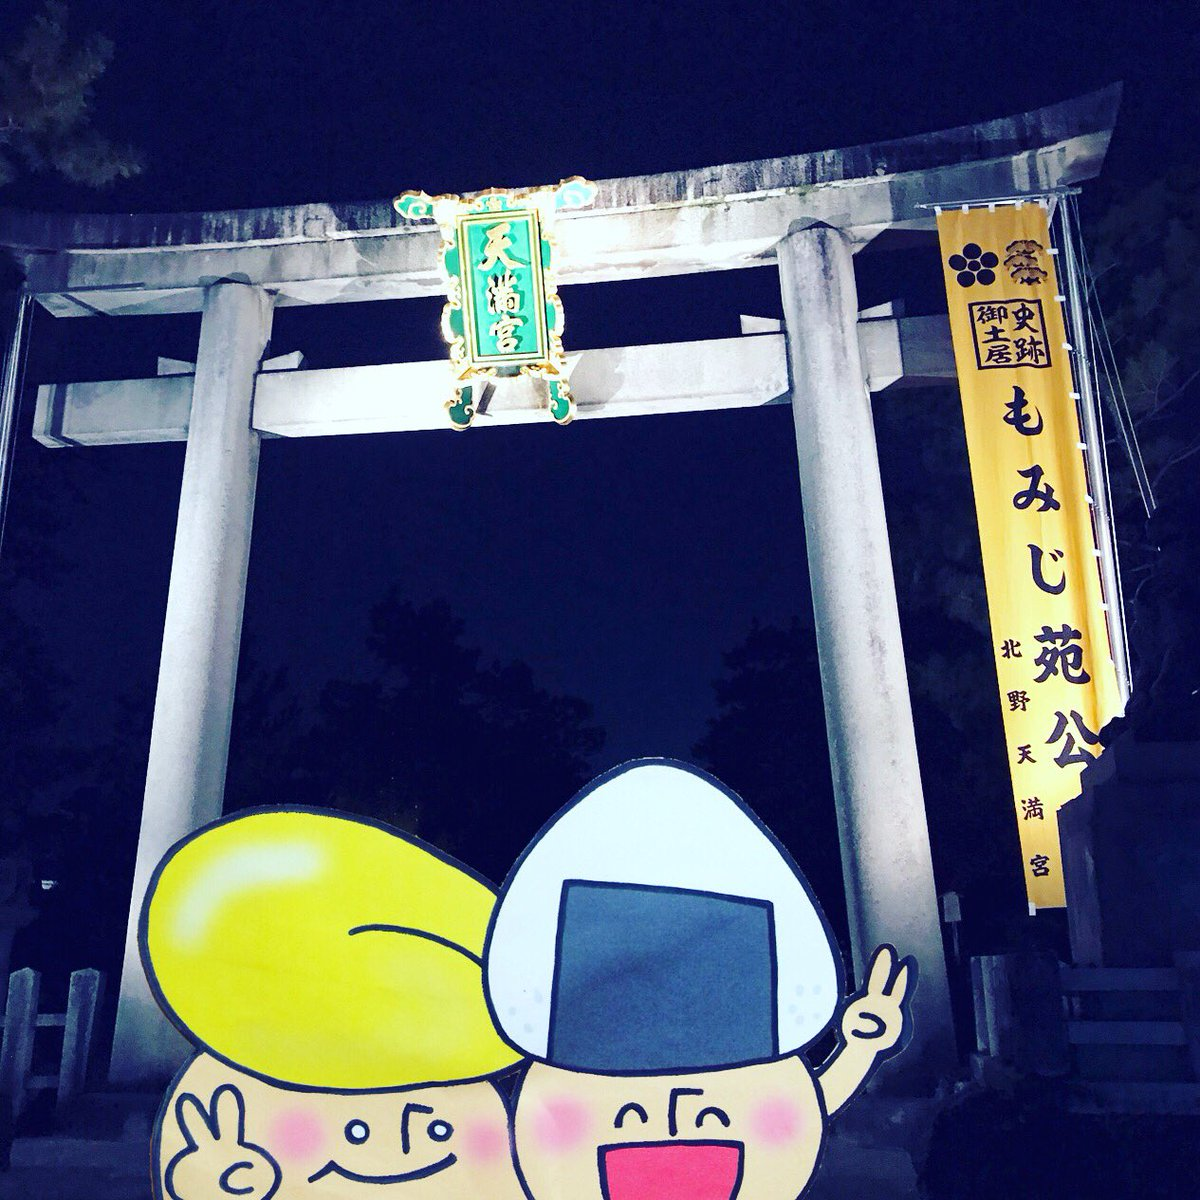 test ツイッターメディア - おむすびきのこさんは京都が大好き。 お散歩途中に学問の神様、北野天満宮にやってきたよ!  Omusubi mushroom loves Kyoto❤️   #japan #kyoto #kyototrip #kyotojapan #日本 #京都 #京都観光 #おむすびきのこさん #yasijun #illustration #イラスト #旅 #散歩 #オススメの京都 #character https://t.co/T8bFrU6YCl